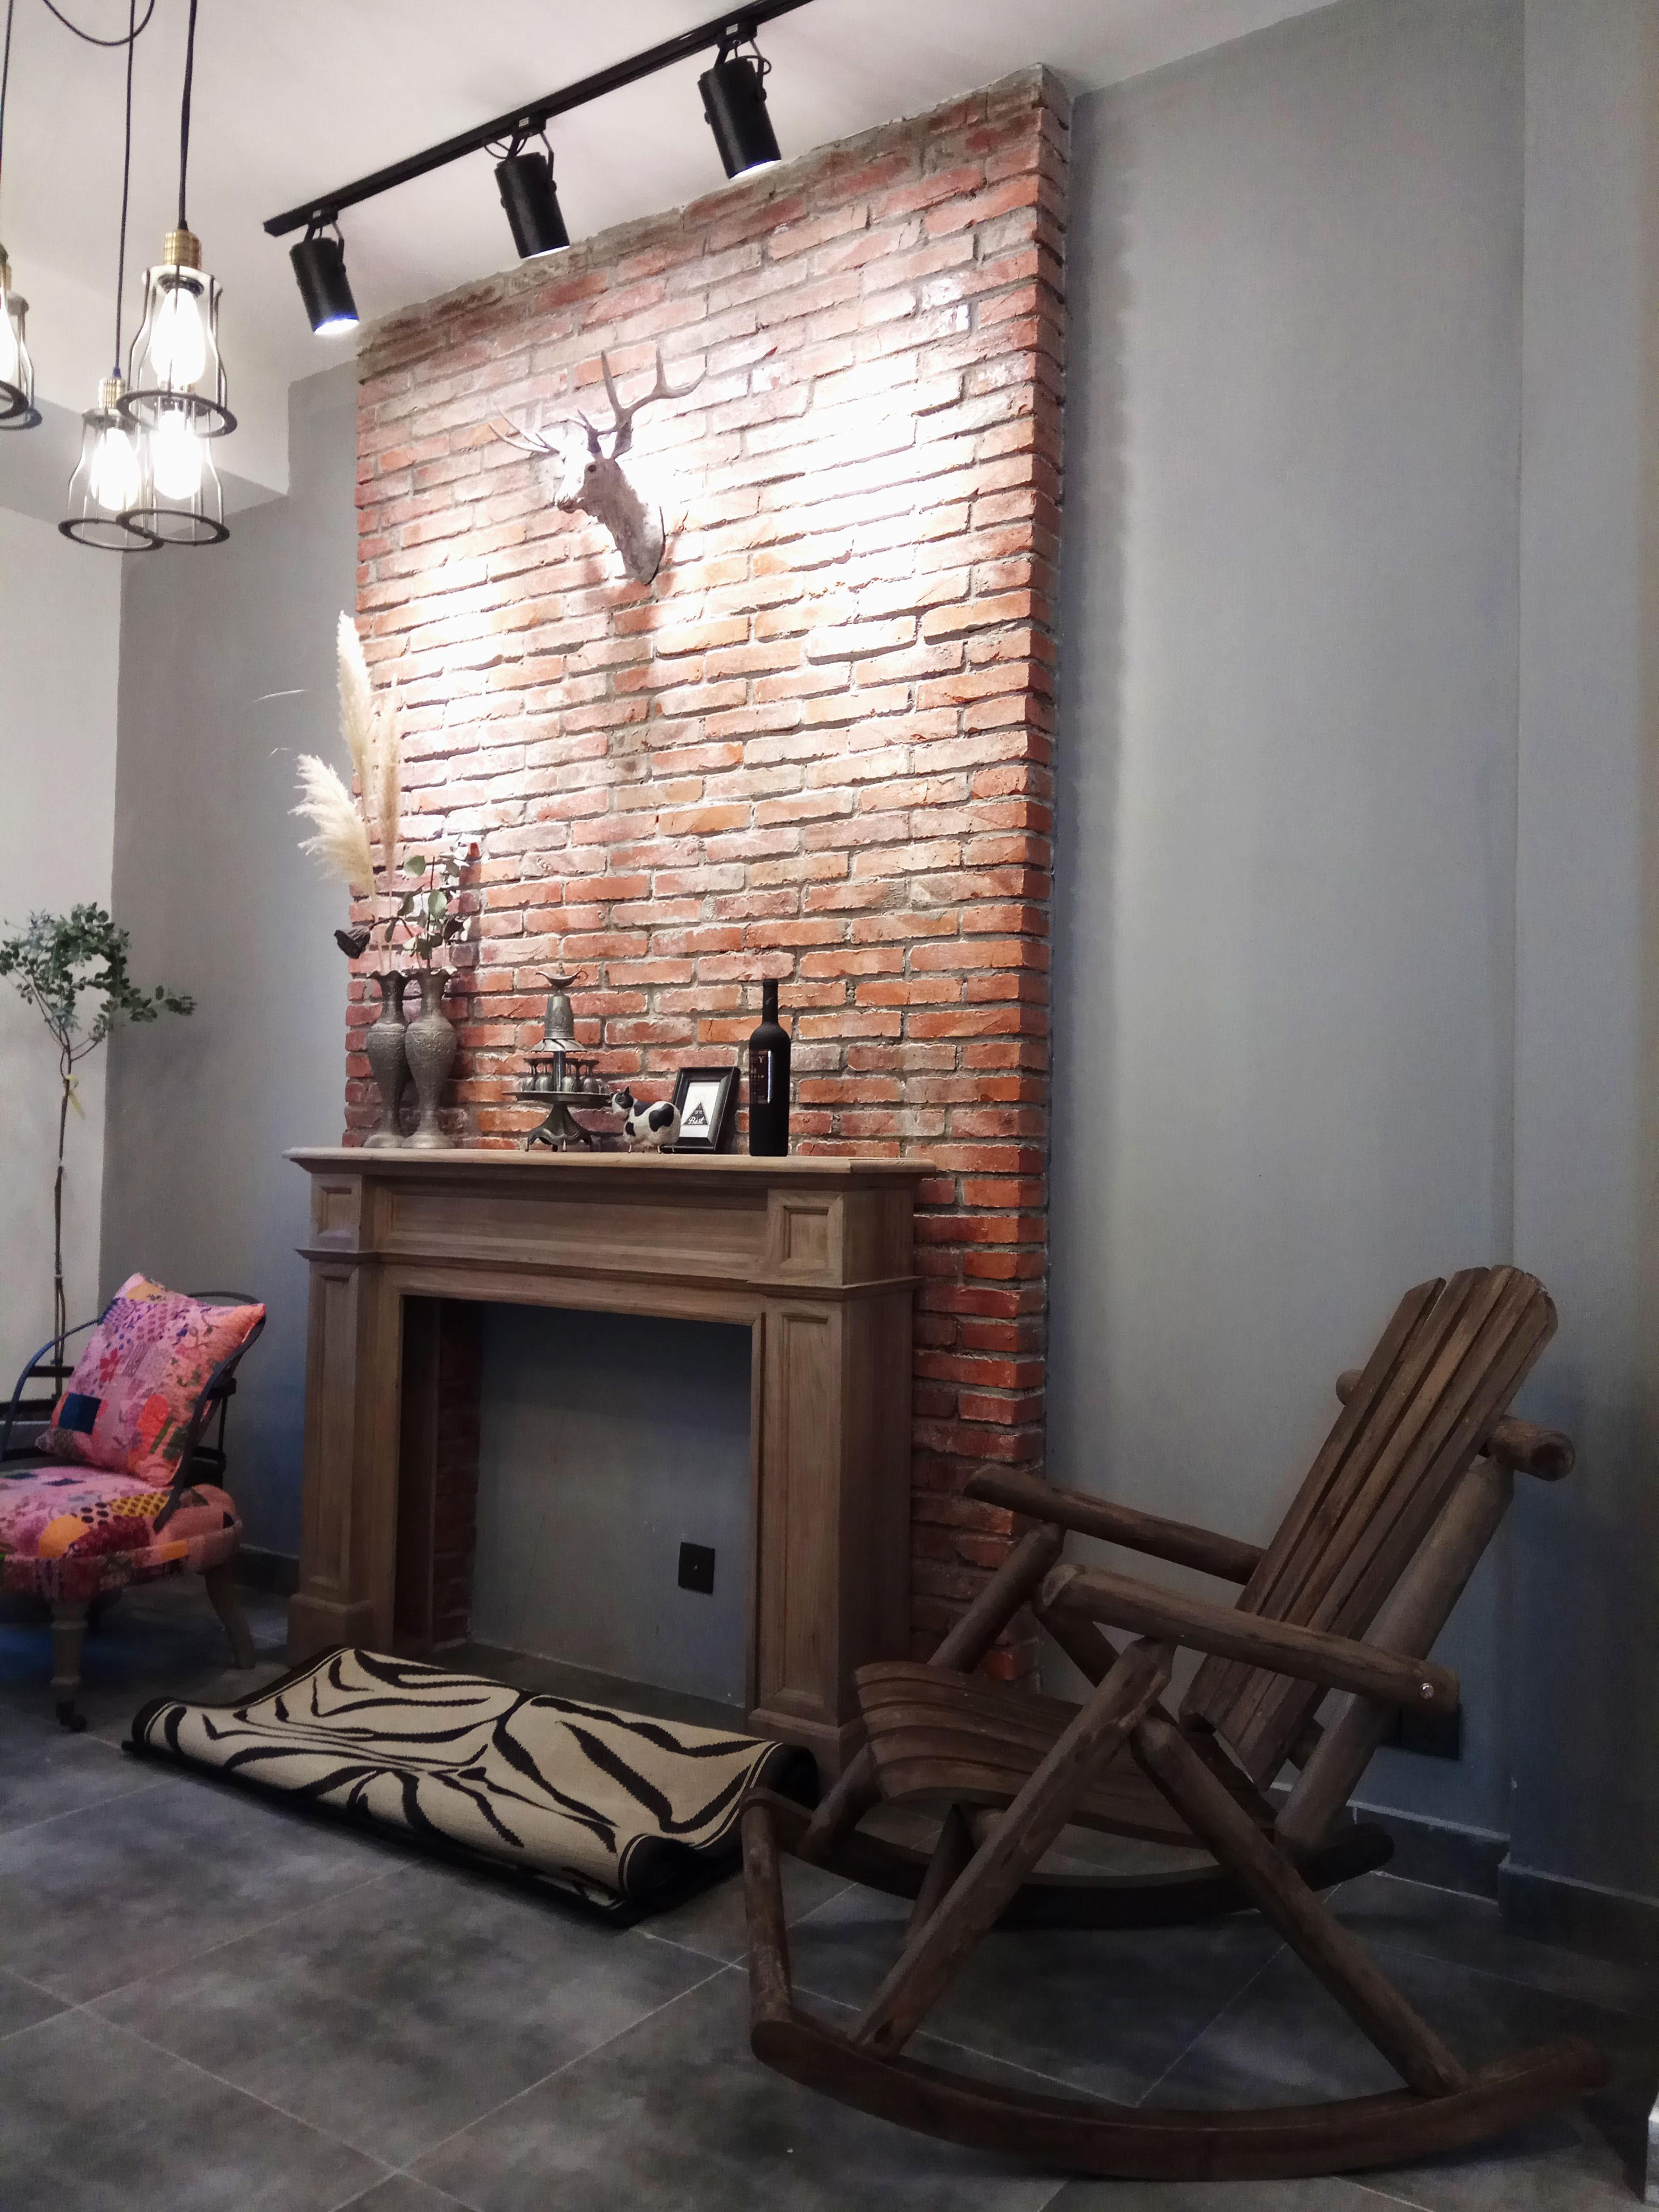 loft工业风装修客厅壁炉造型设计图